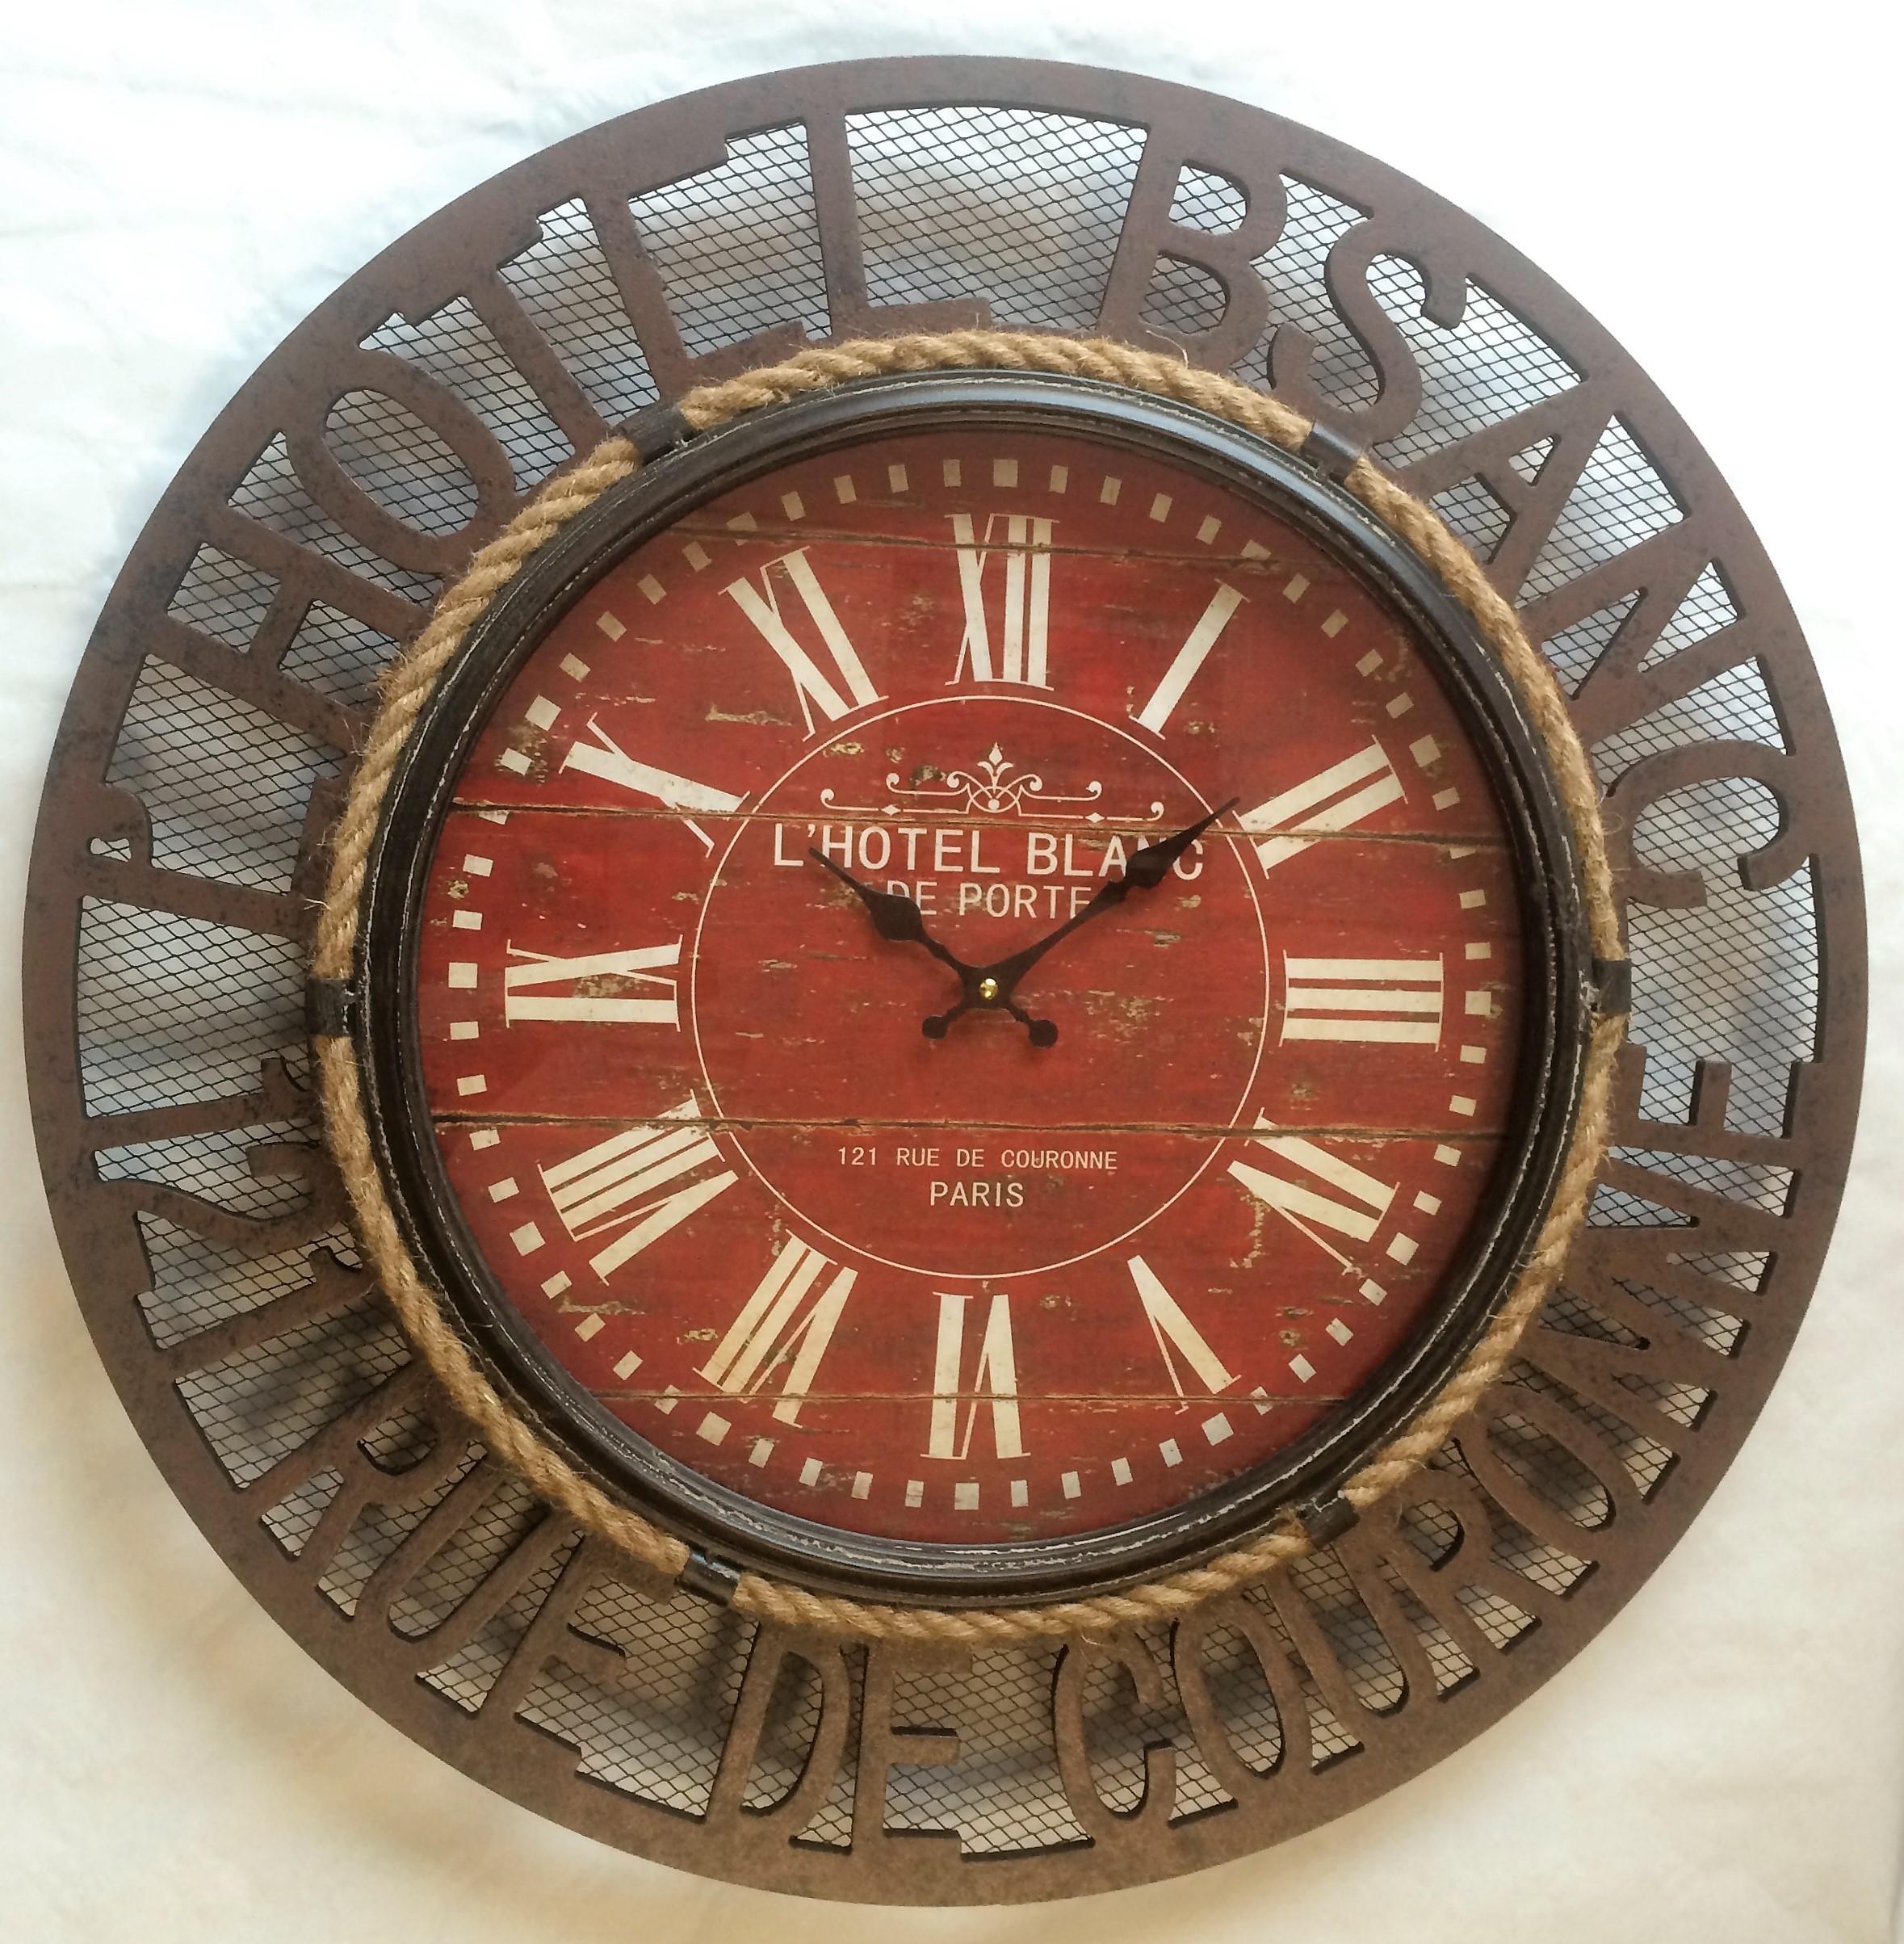 Relojes Pared Madera Relojes De Pared Relojes Digitales De  ~ Relojes Grandes De Pared Vintage